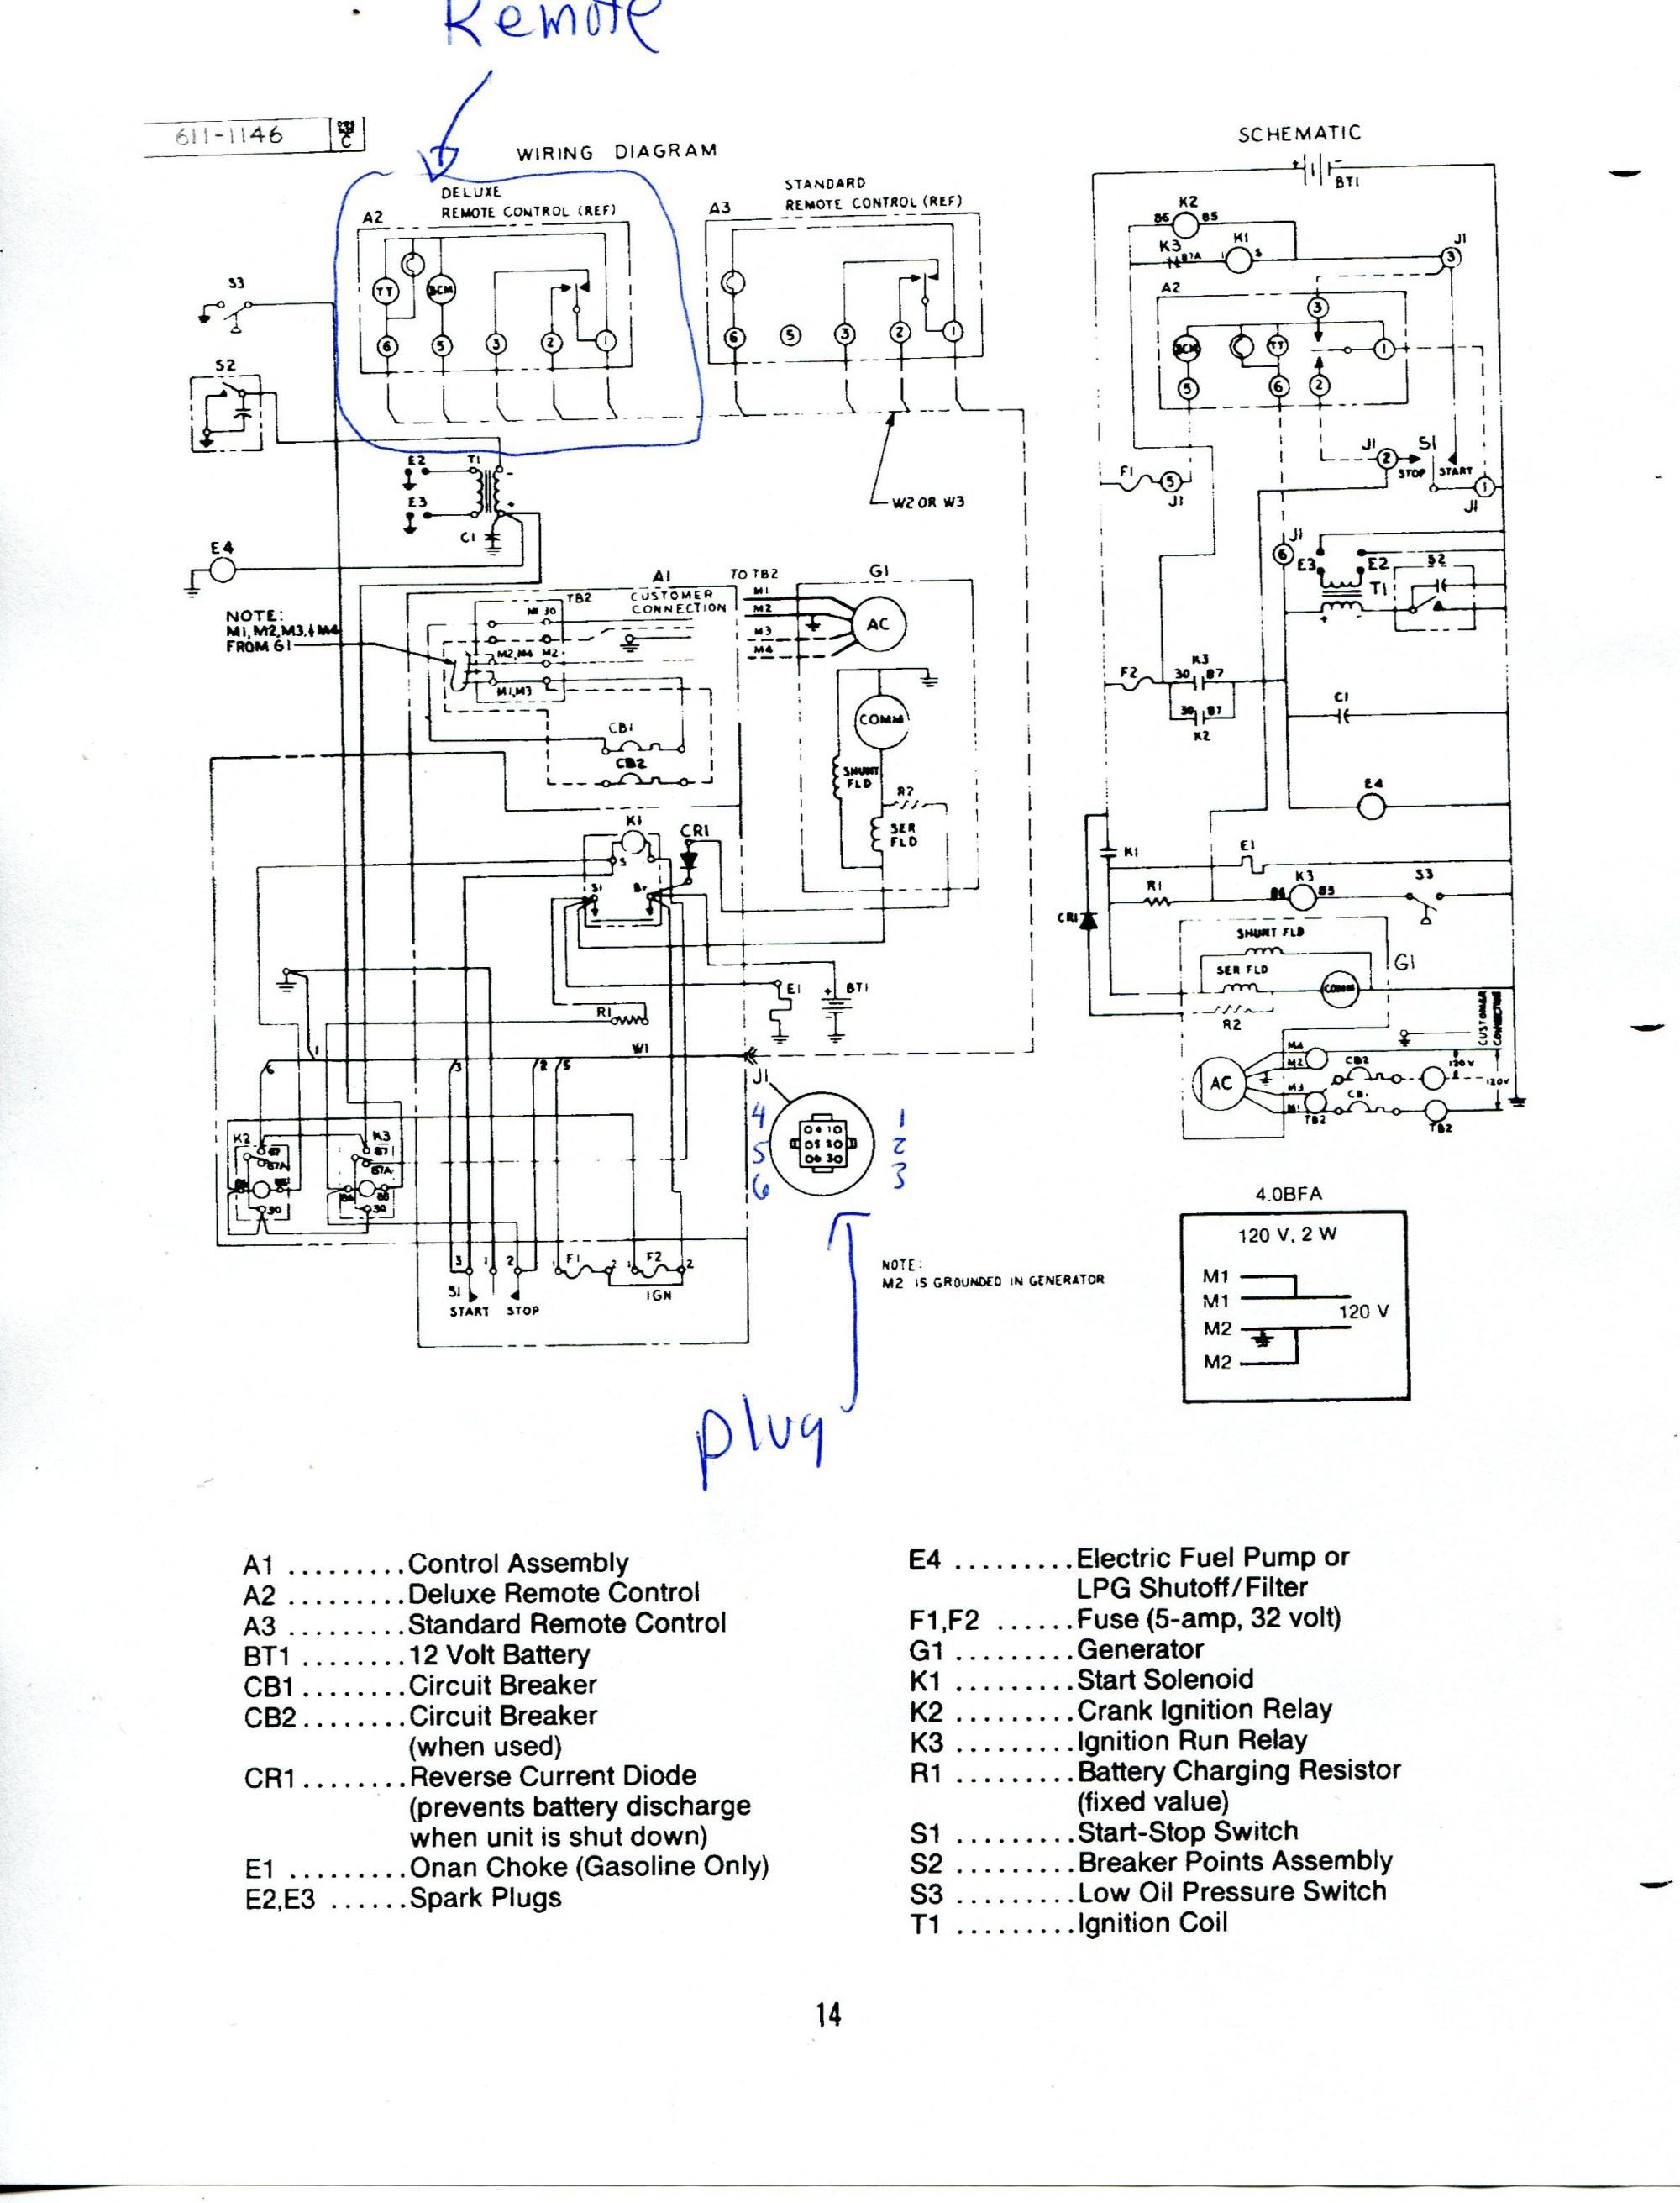 hight resolution of wiring diagram an generator valid luxury an generator electric choke circuit gift simple wiring